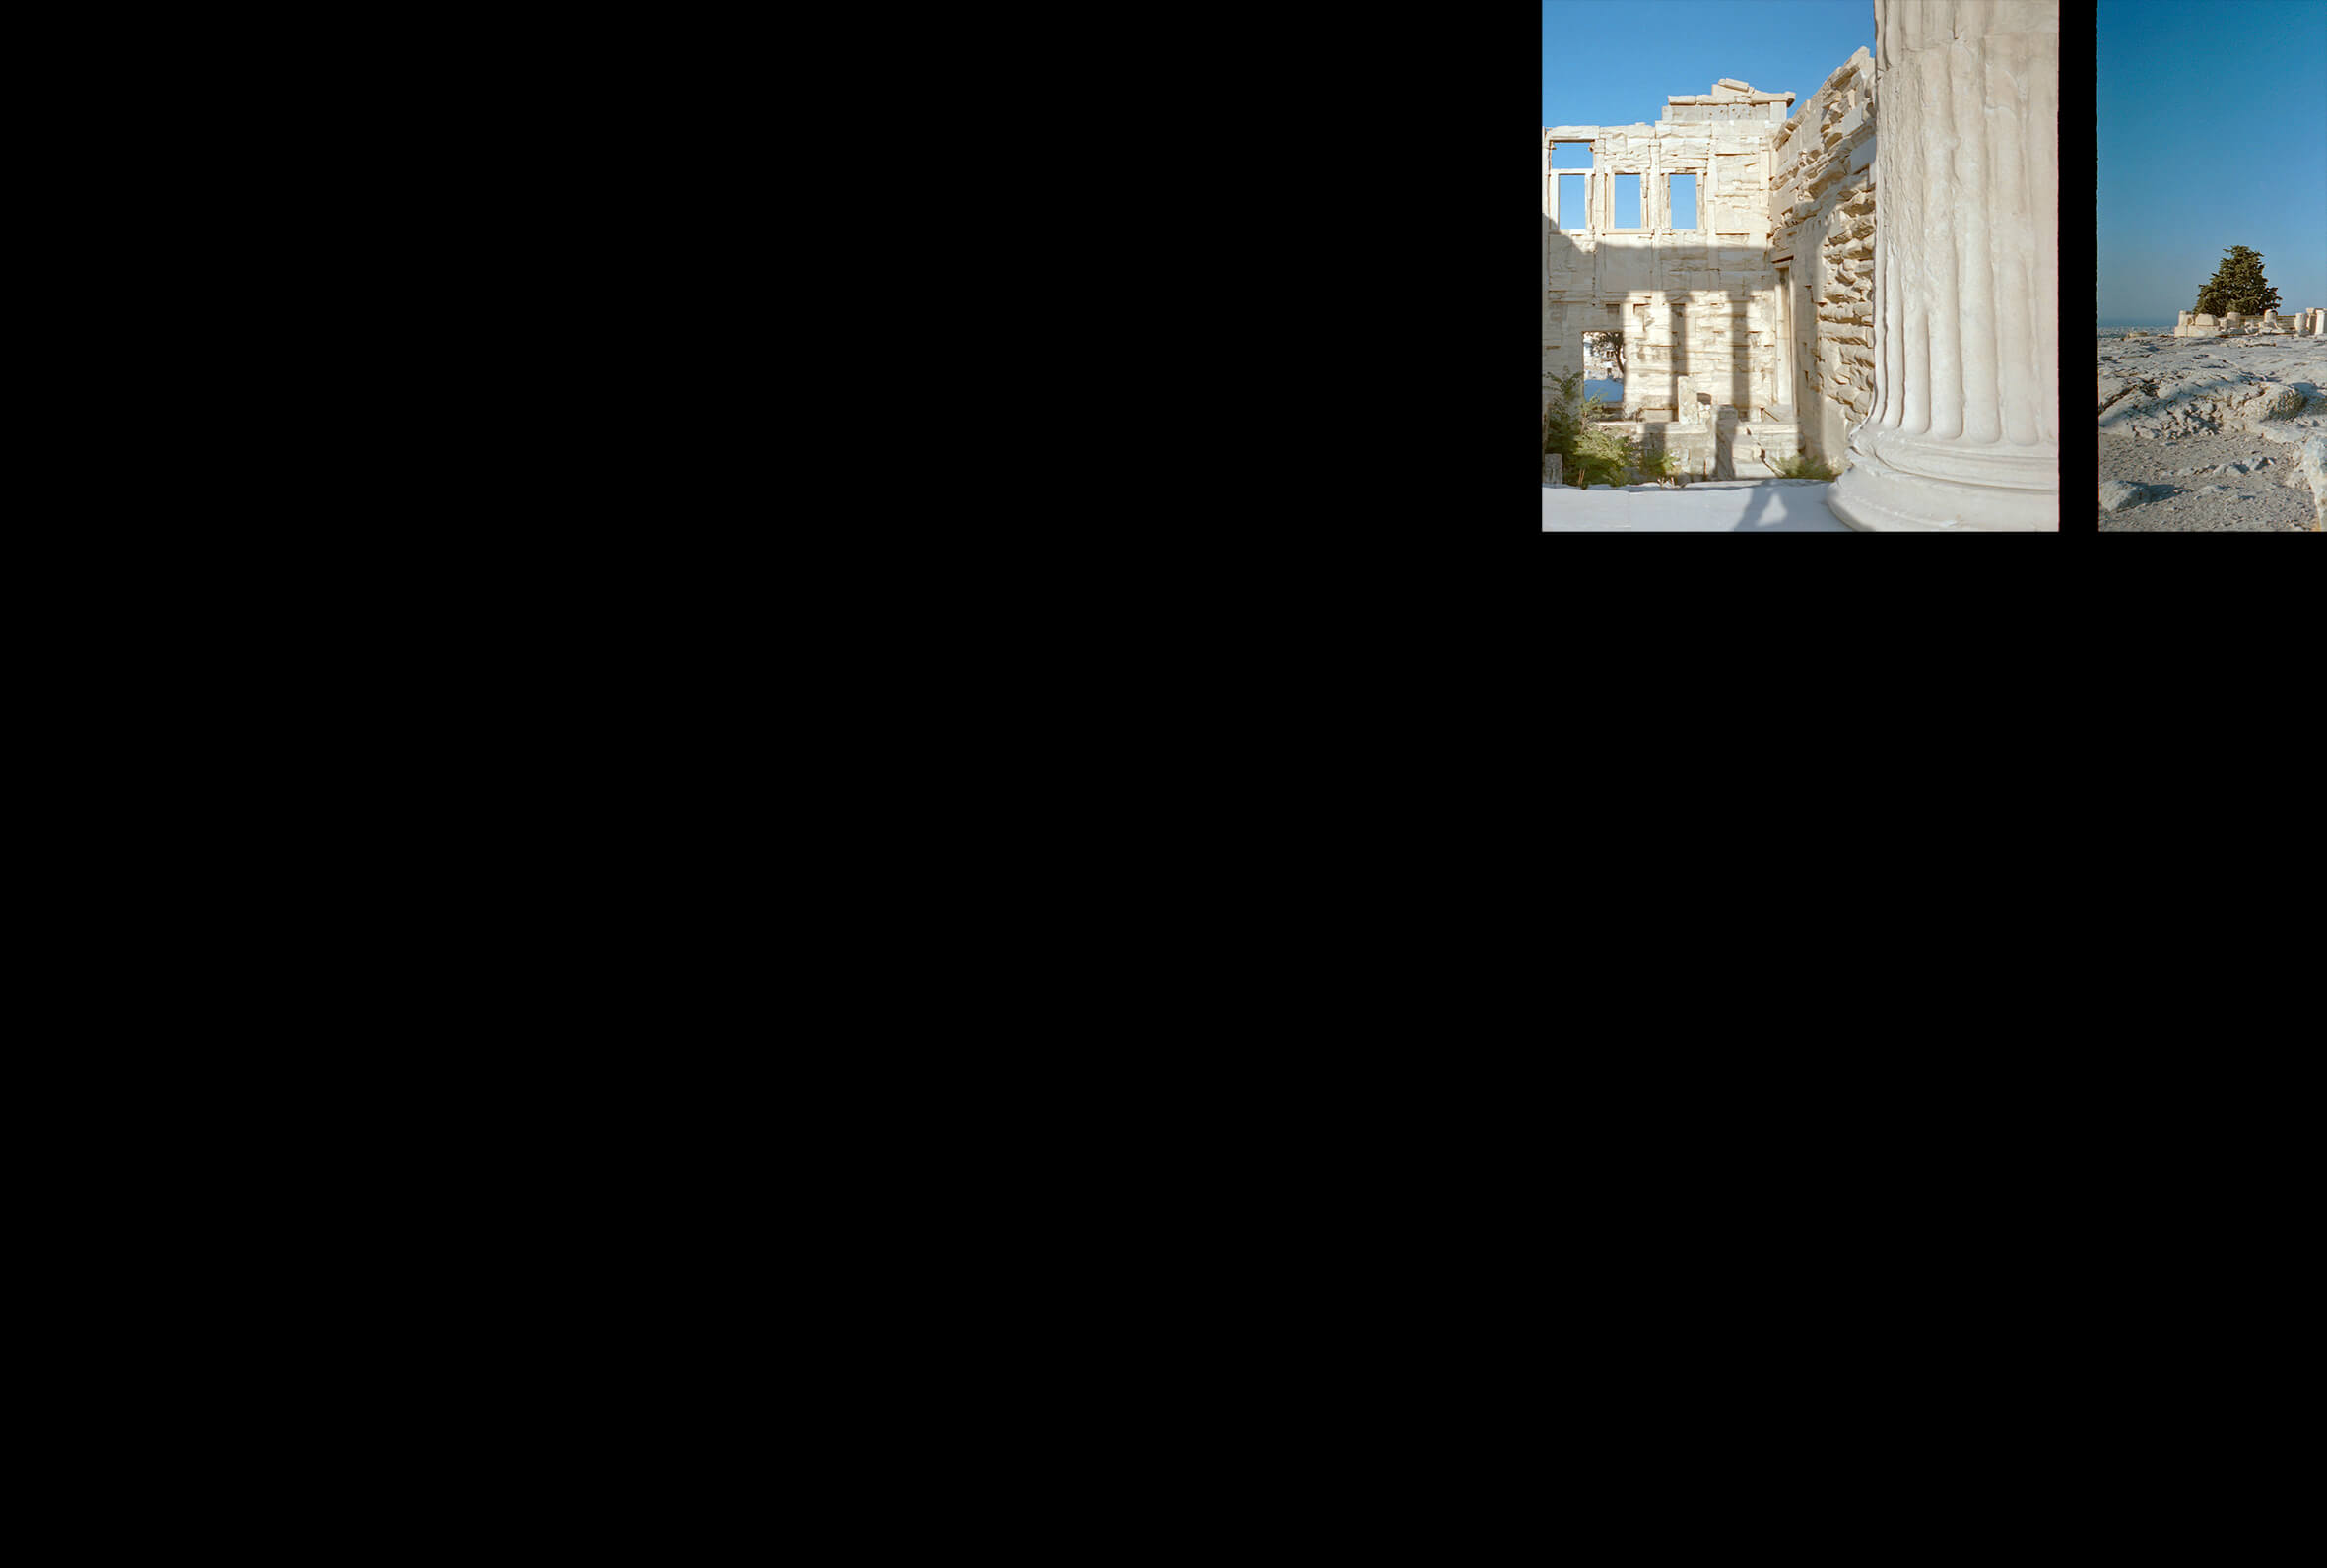 "Libro de horas: Lunes [""Book of Hours: Monday""], 2020. (Detail) | Diario de sucesos poco notables [Journal of (un)remarkable events] | ProjecteSD"